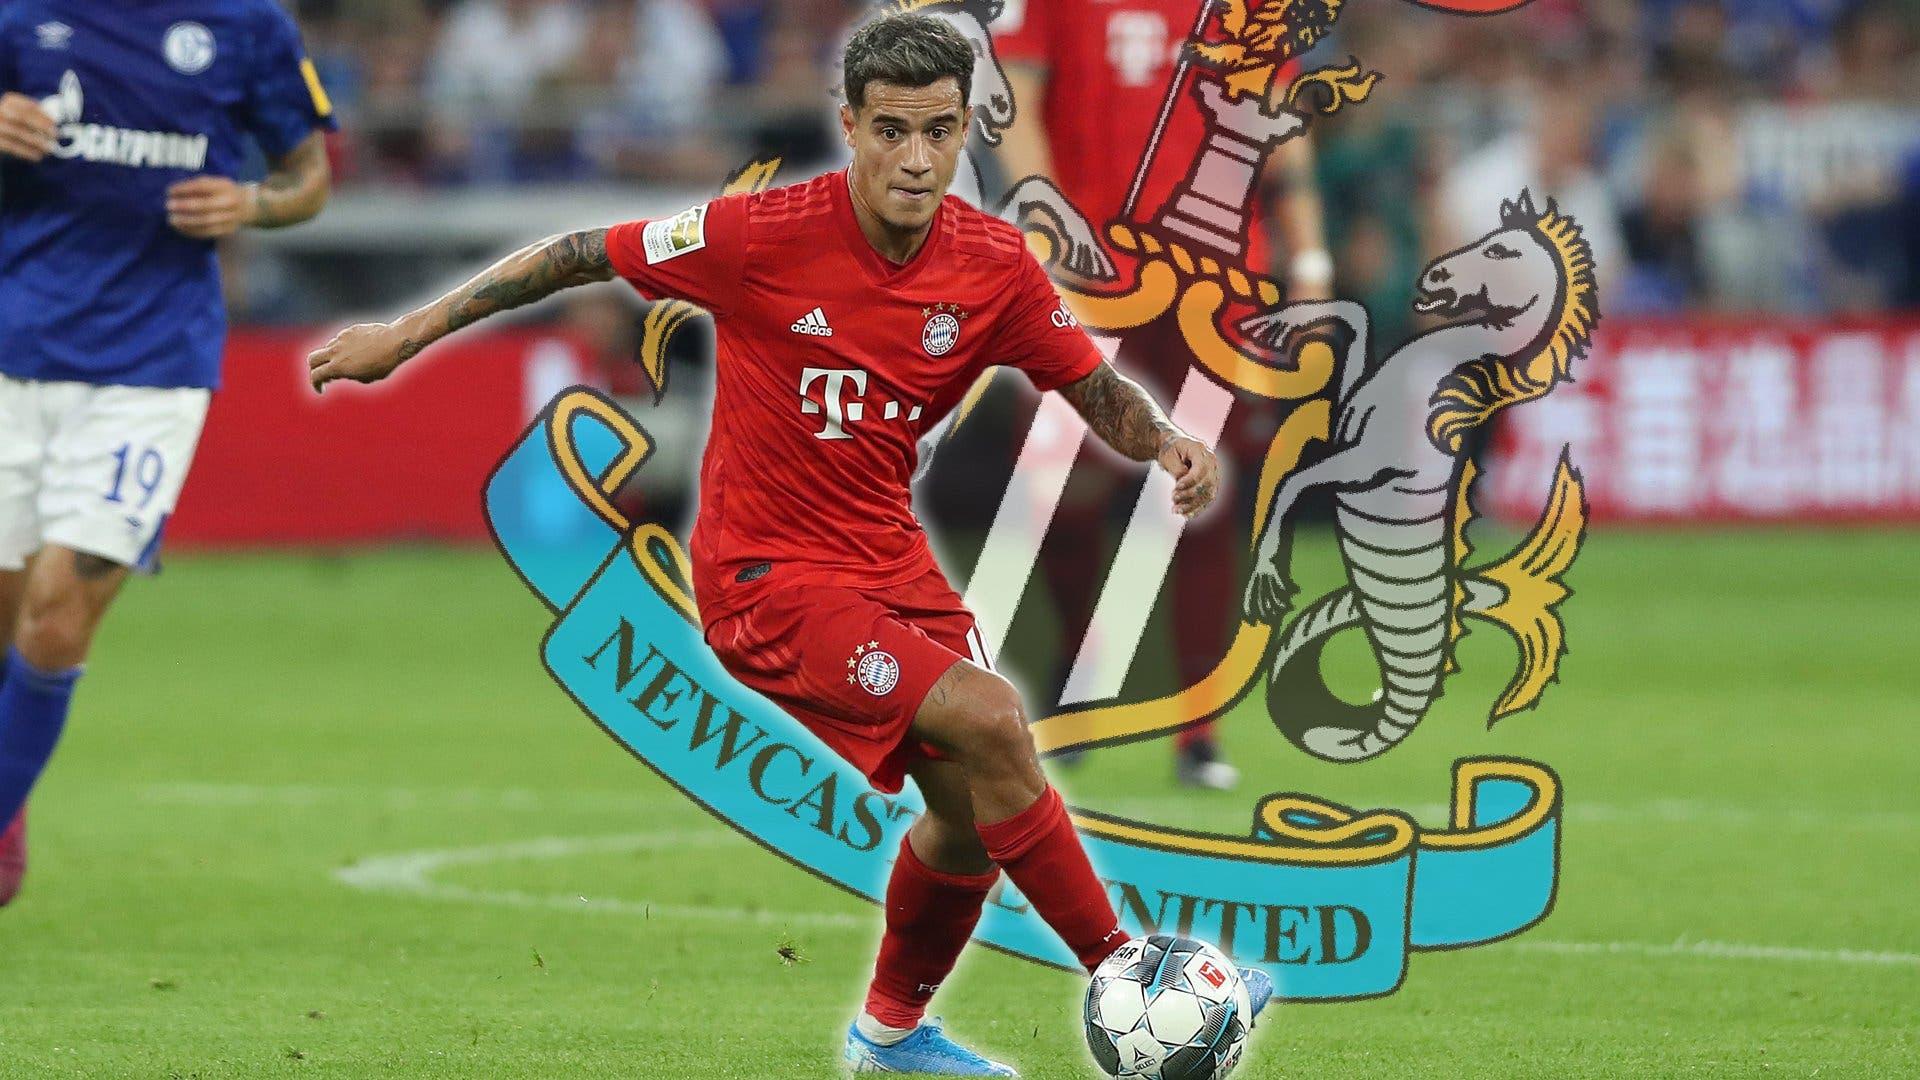 Newcastle Coutinho